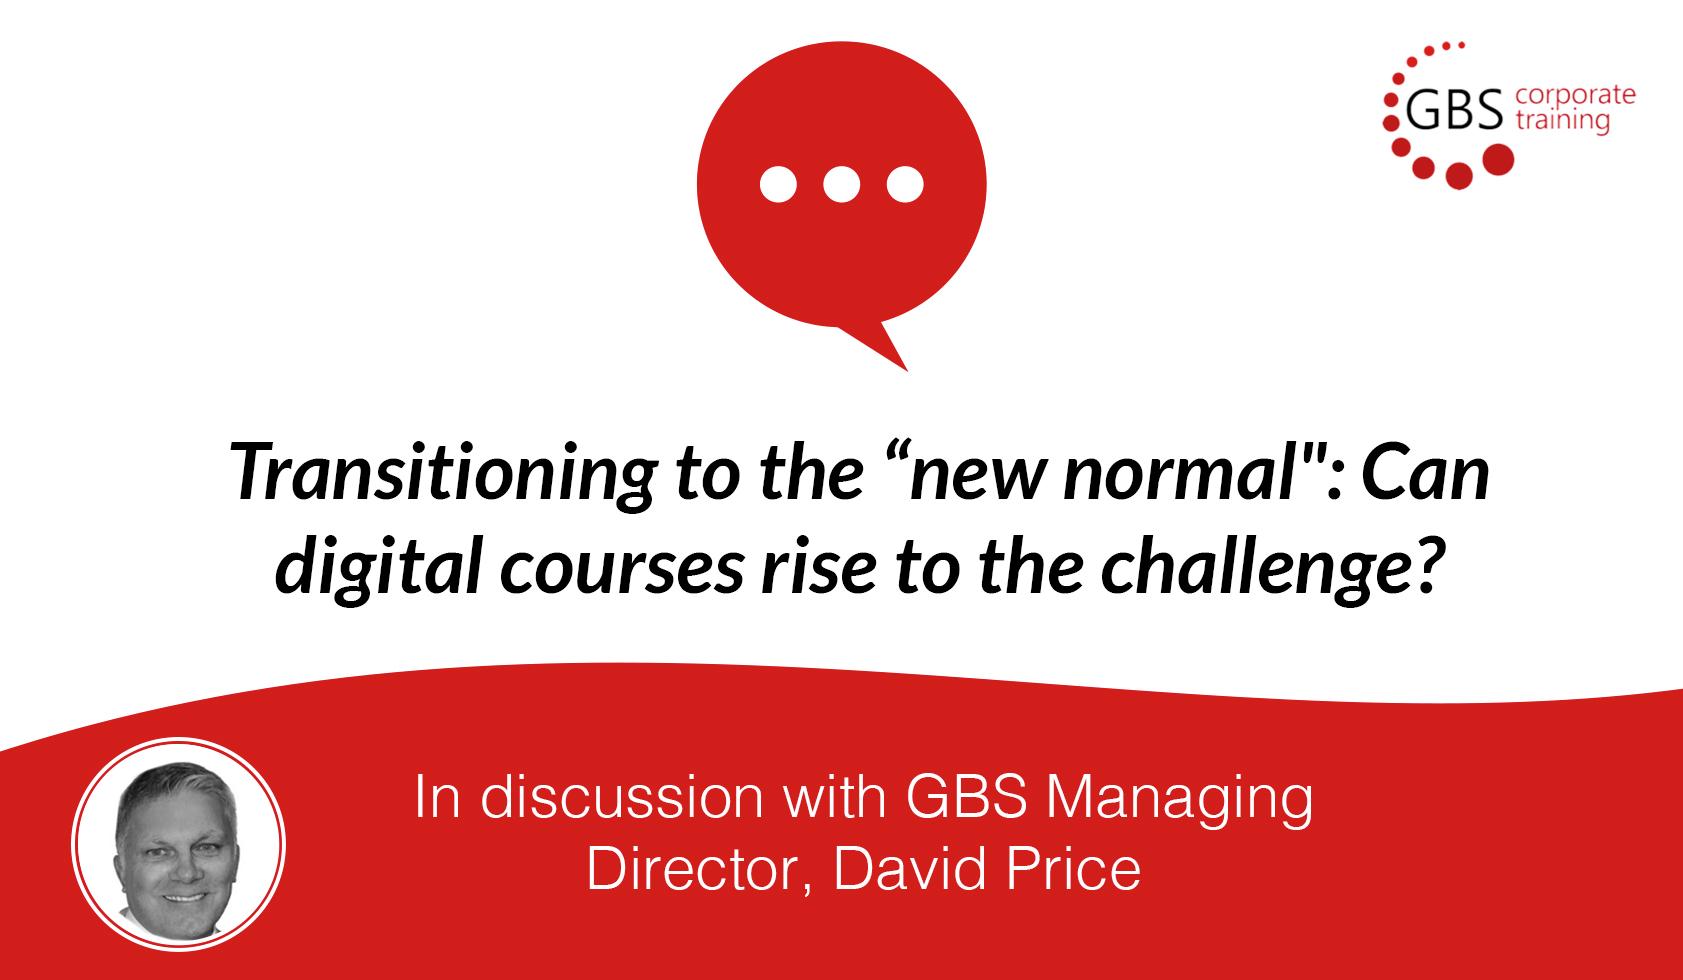 Gbs-david-price-interview.jpg